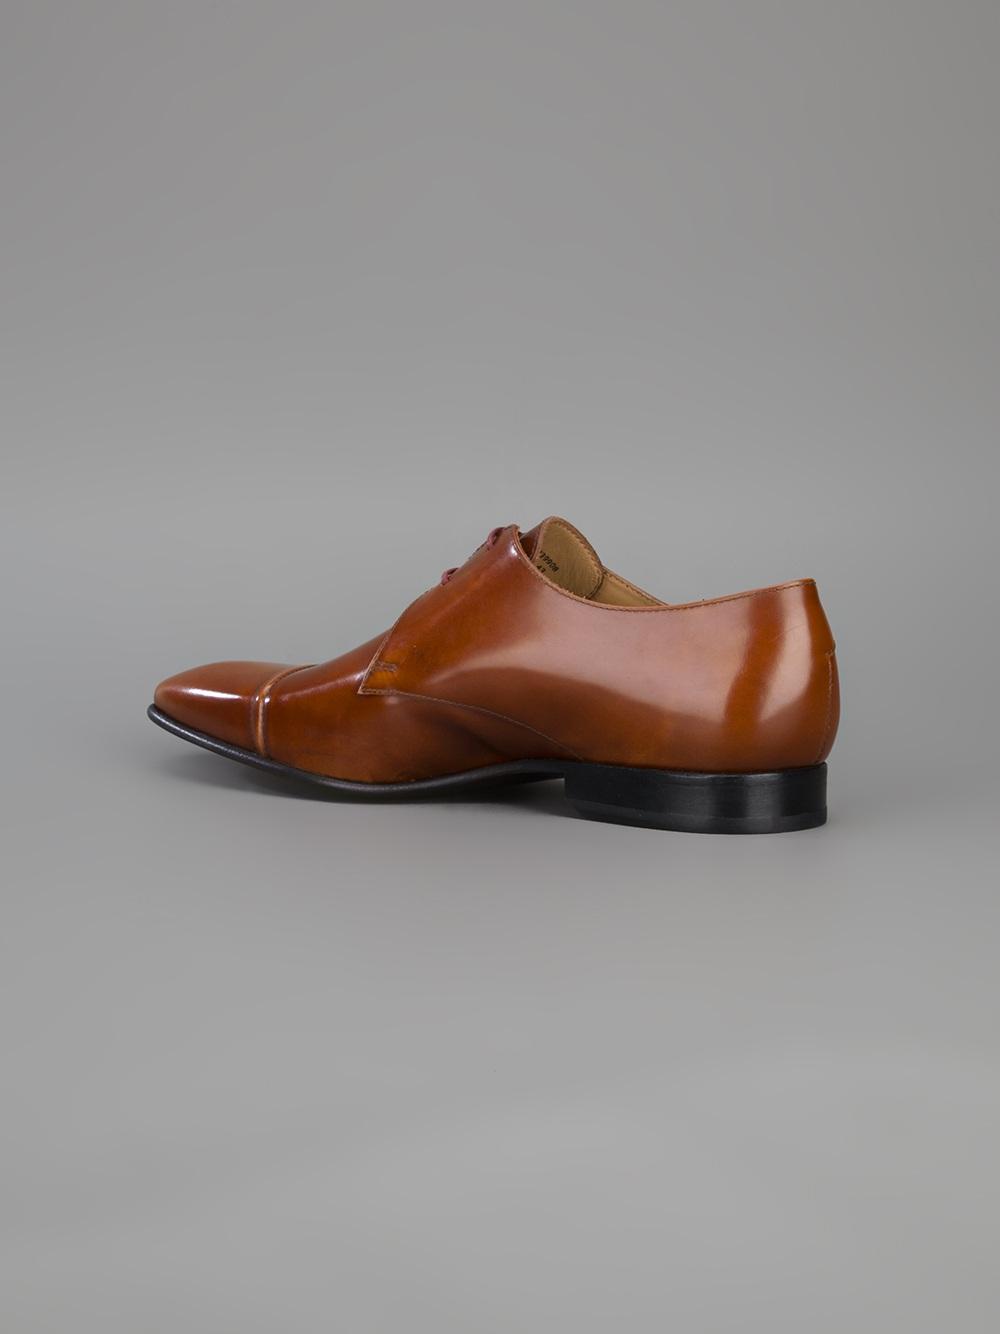 Ps Par Des Chaussures Derby Paul Smith 2yEAhX